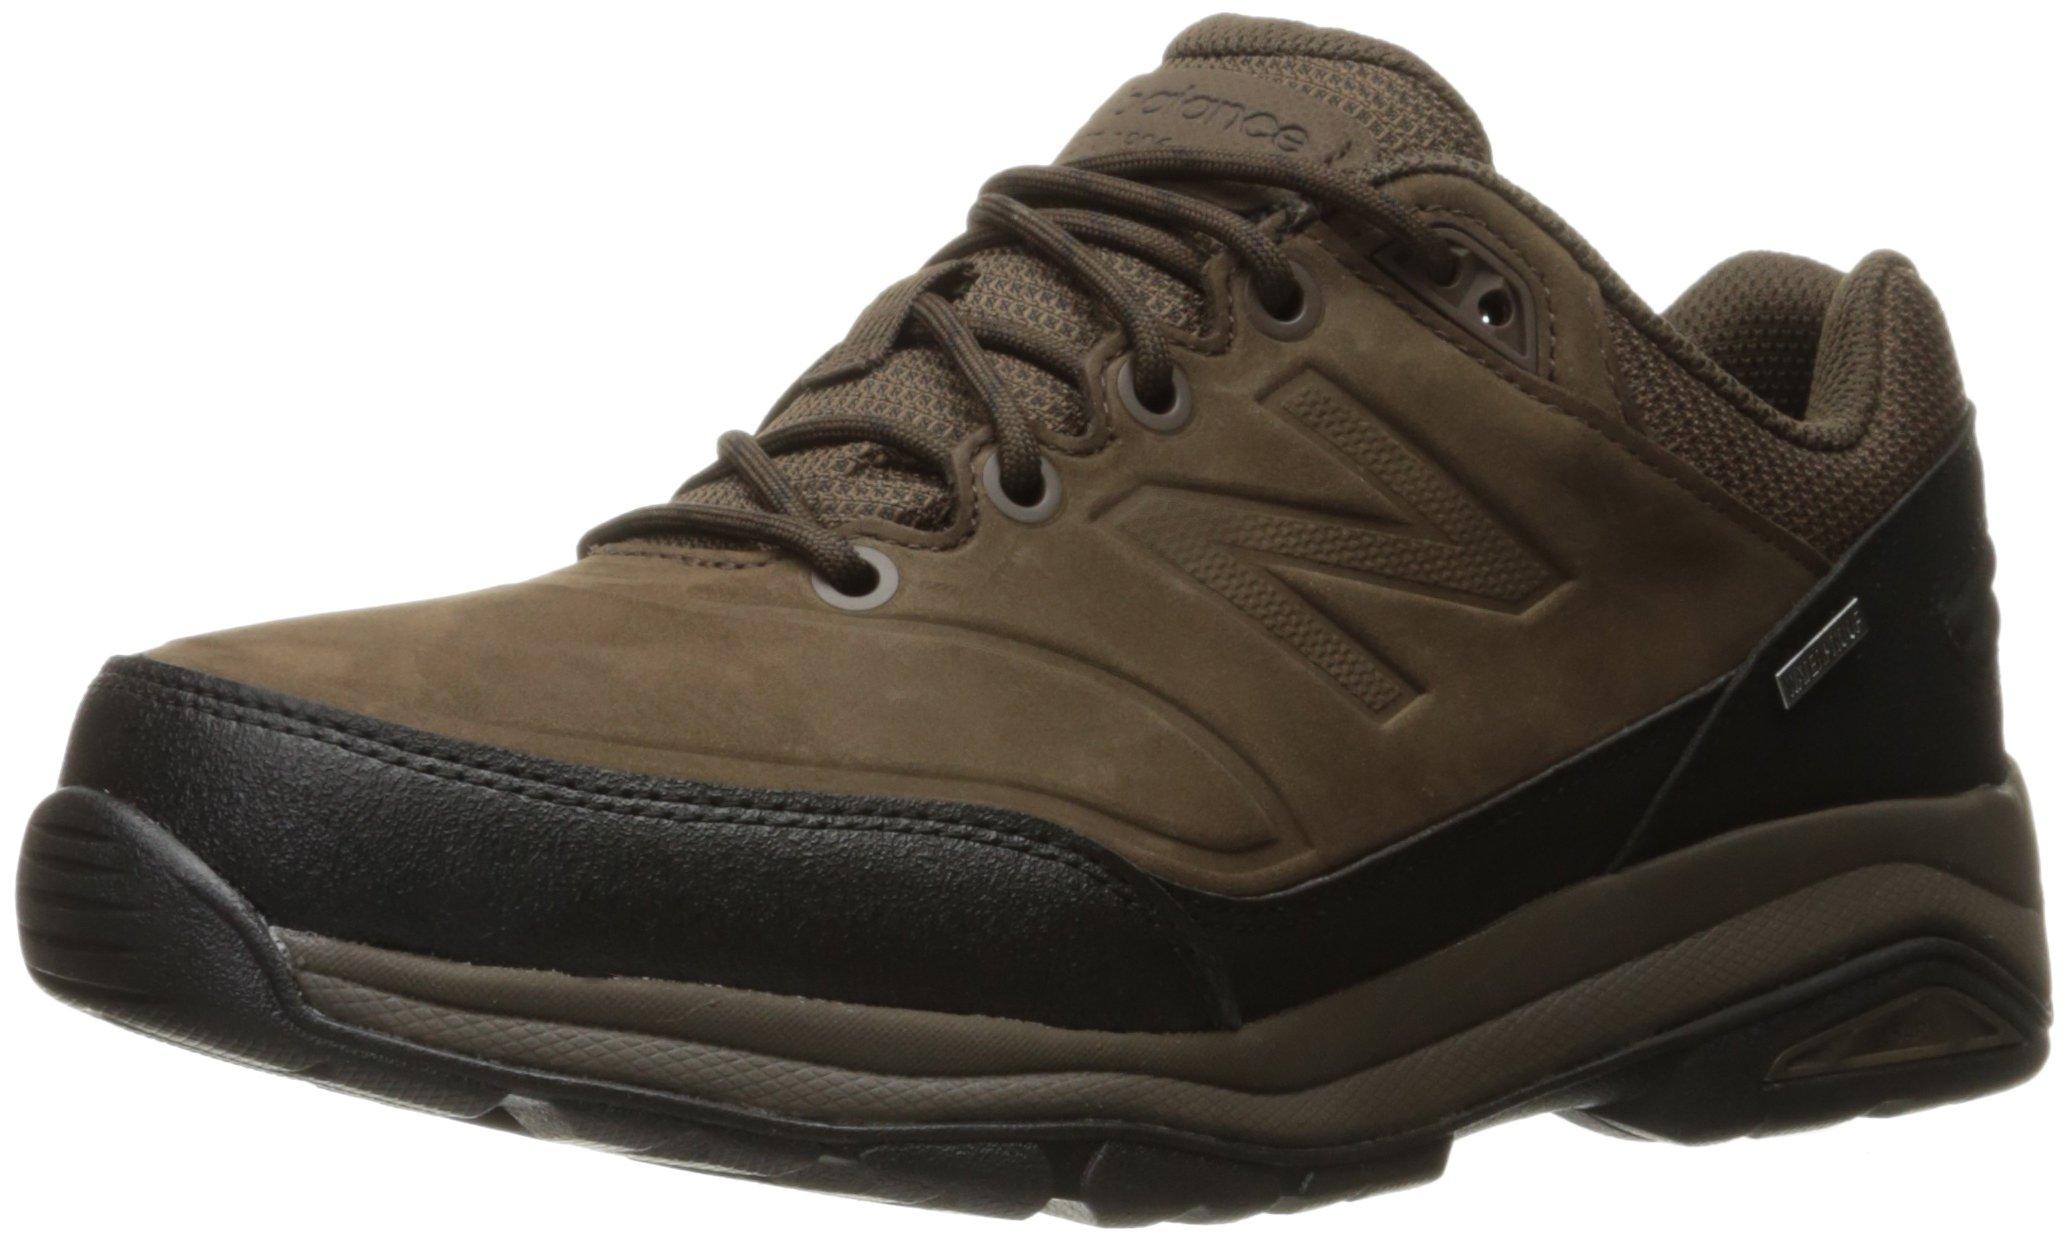 New Balance Men's M1300v1 Walking Shoe, Chocolate, 10.5 D US by New Balance